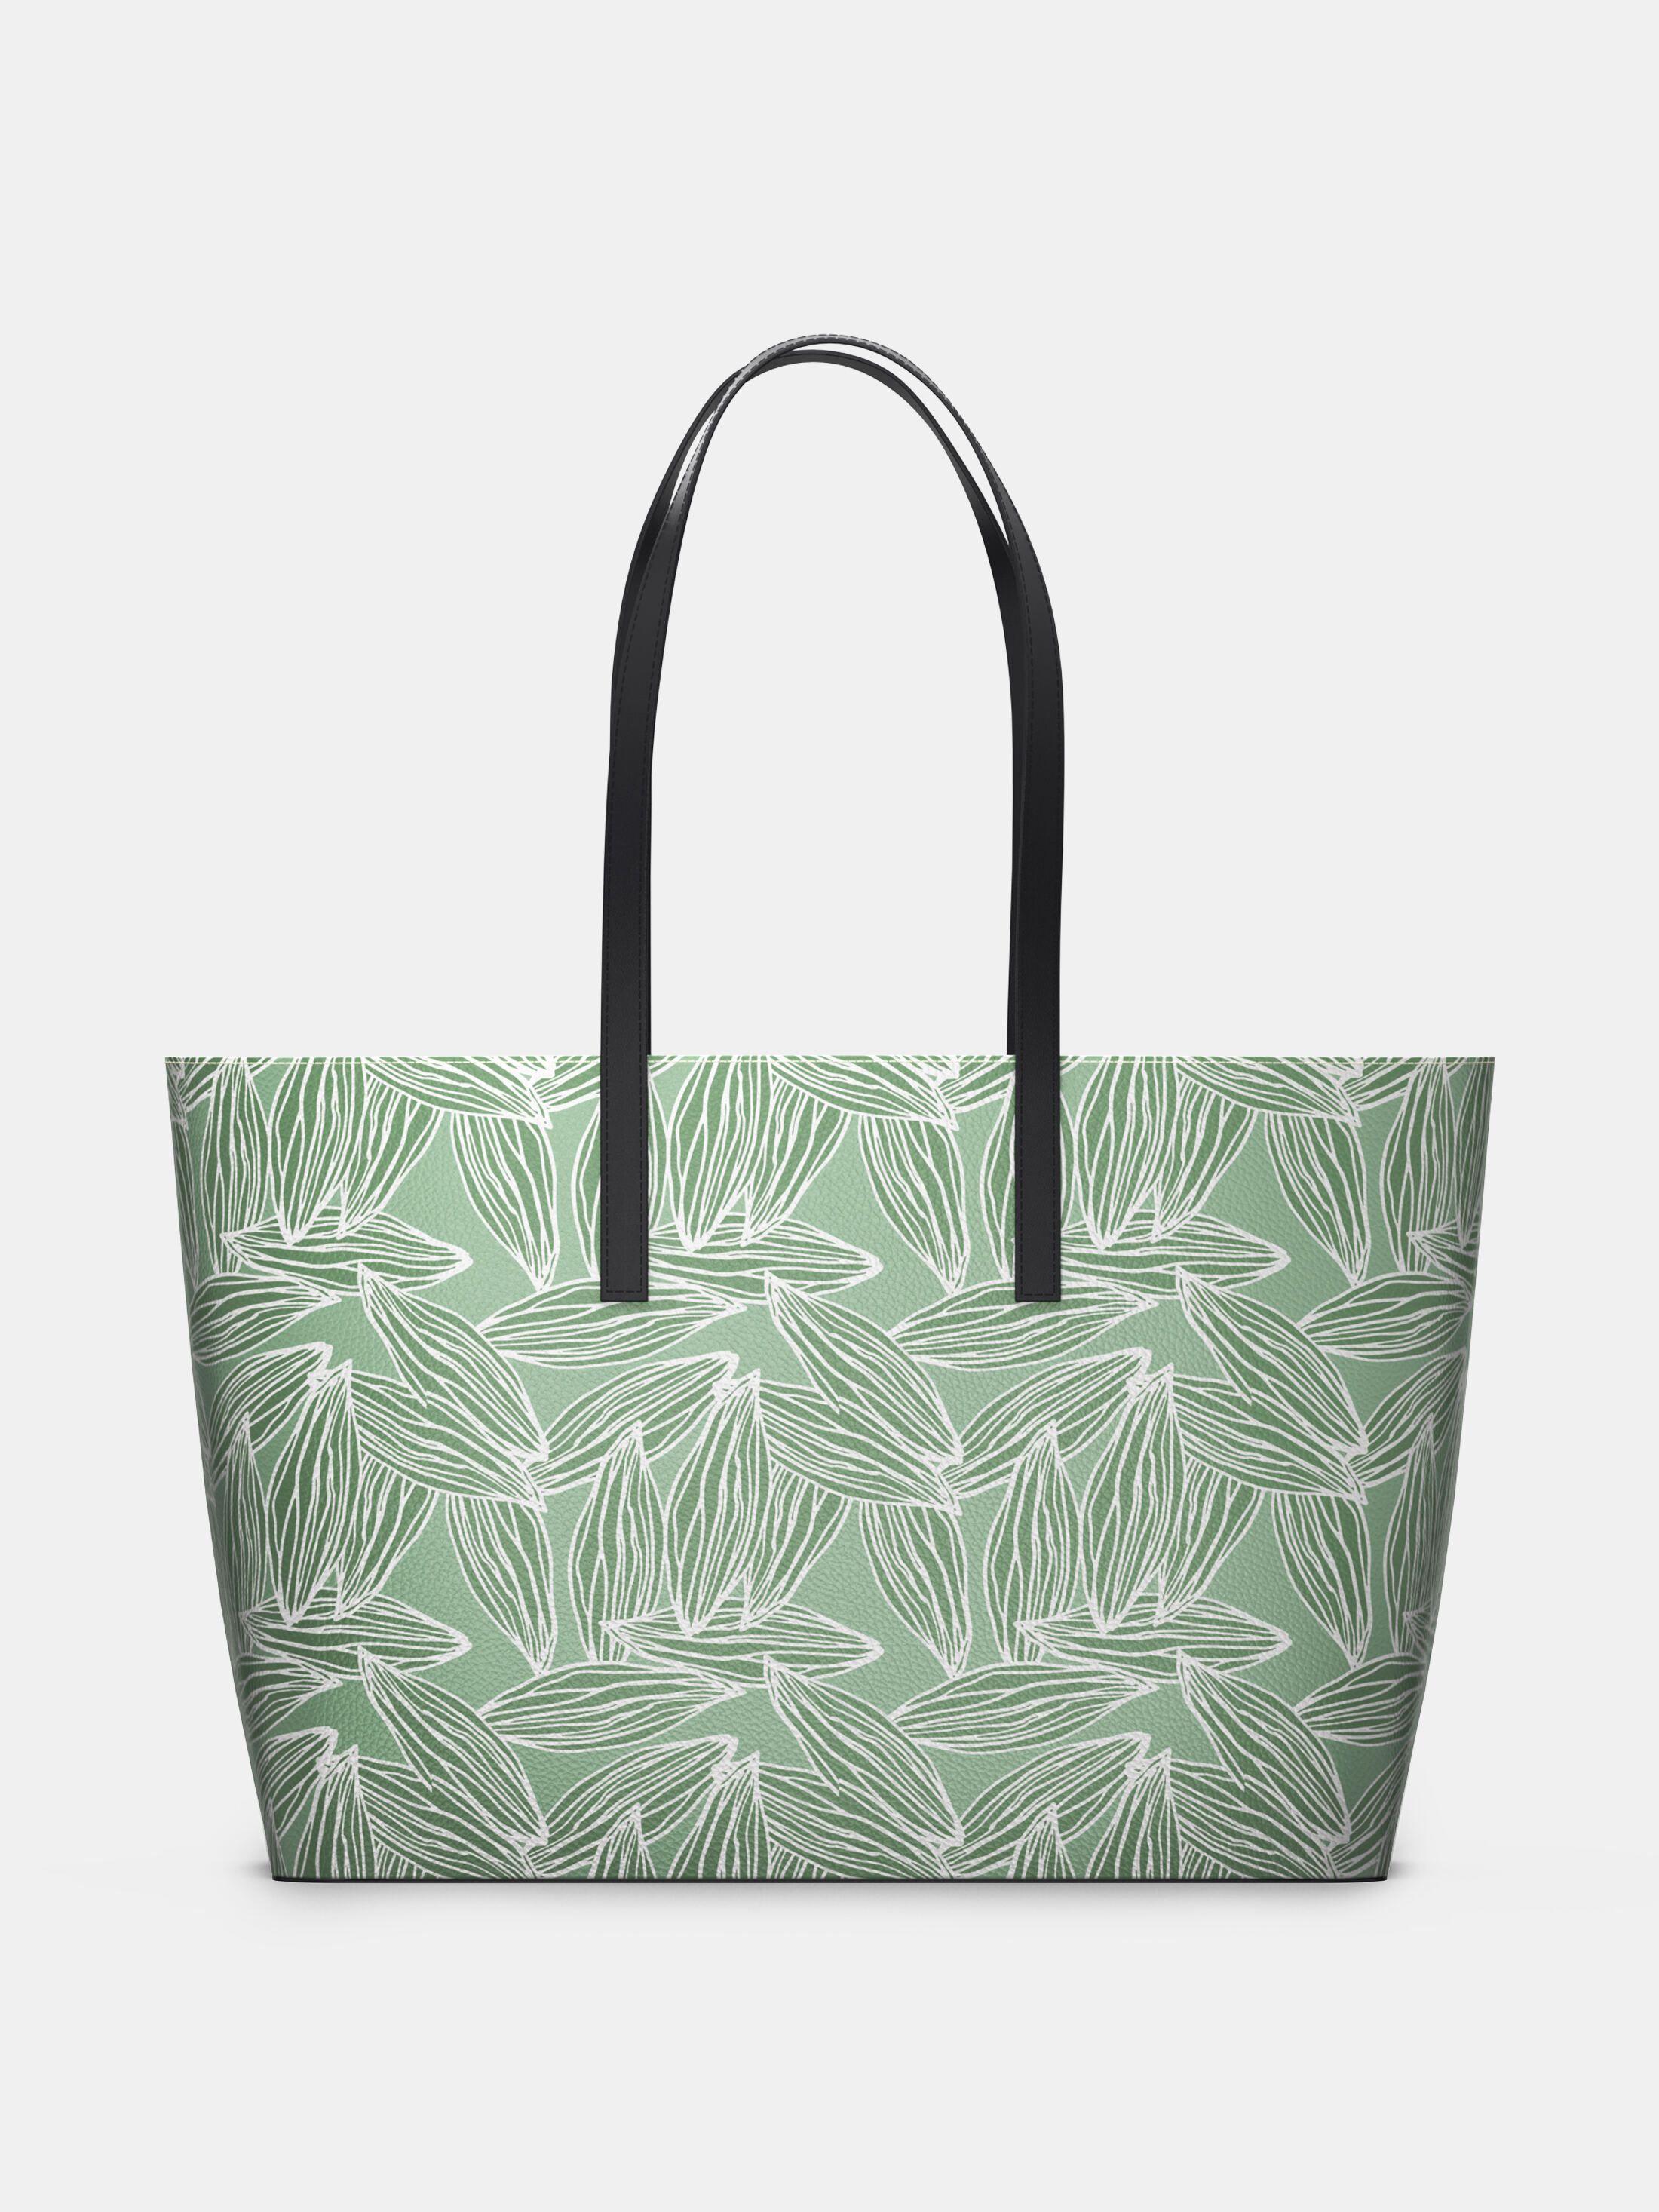 custom leather Kika tote bag